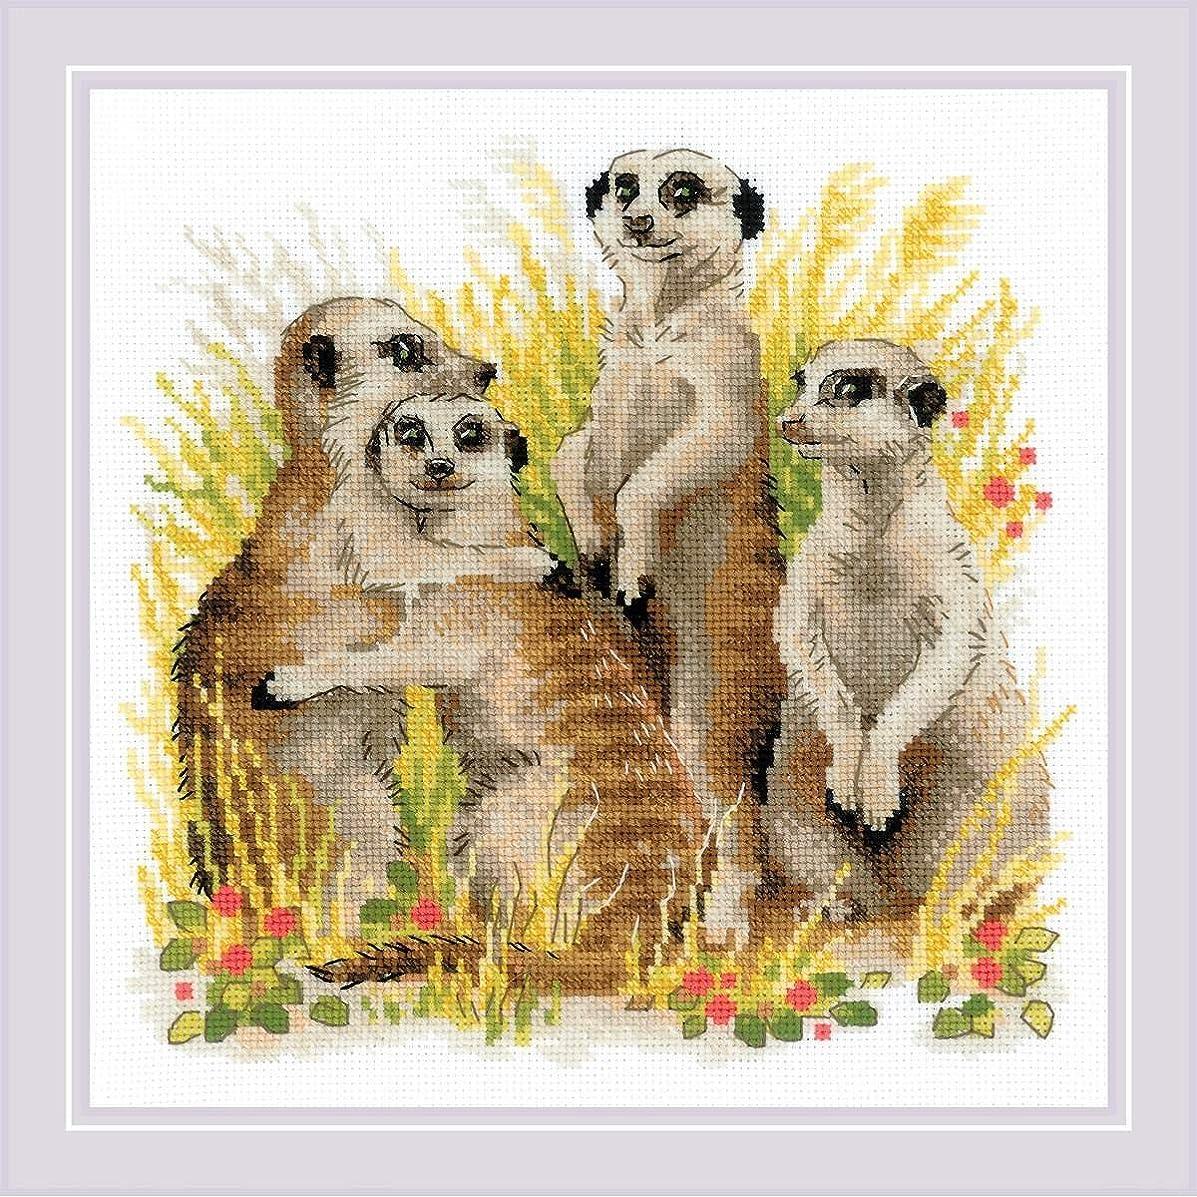 RIOLIS 1761 - Meerkats - Counted Cross Stitch Kit 9?